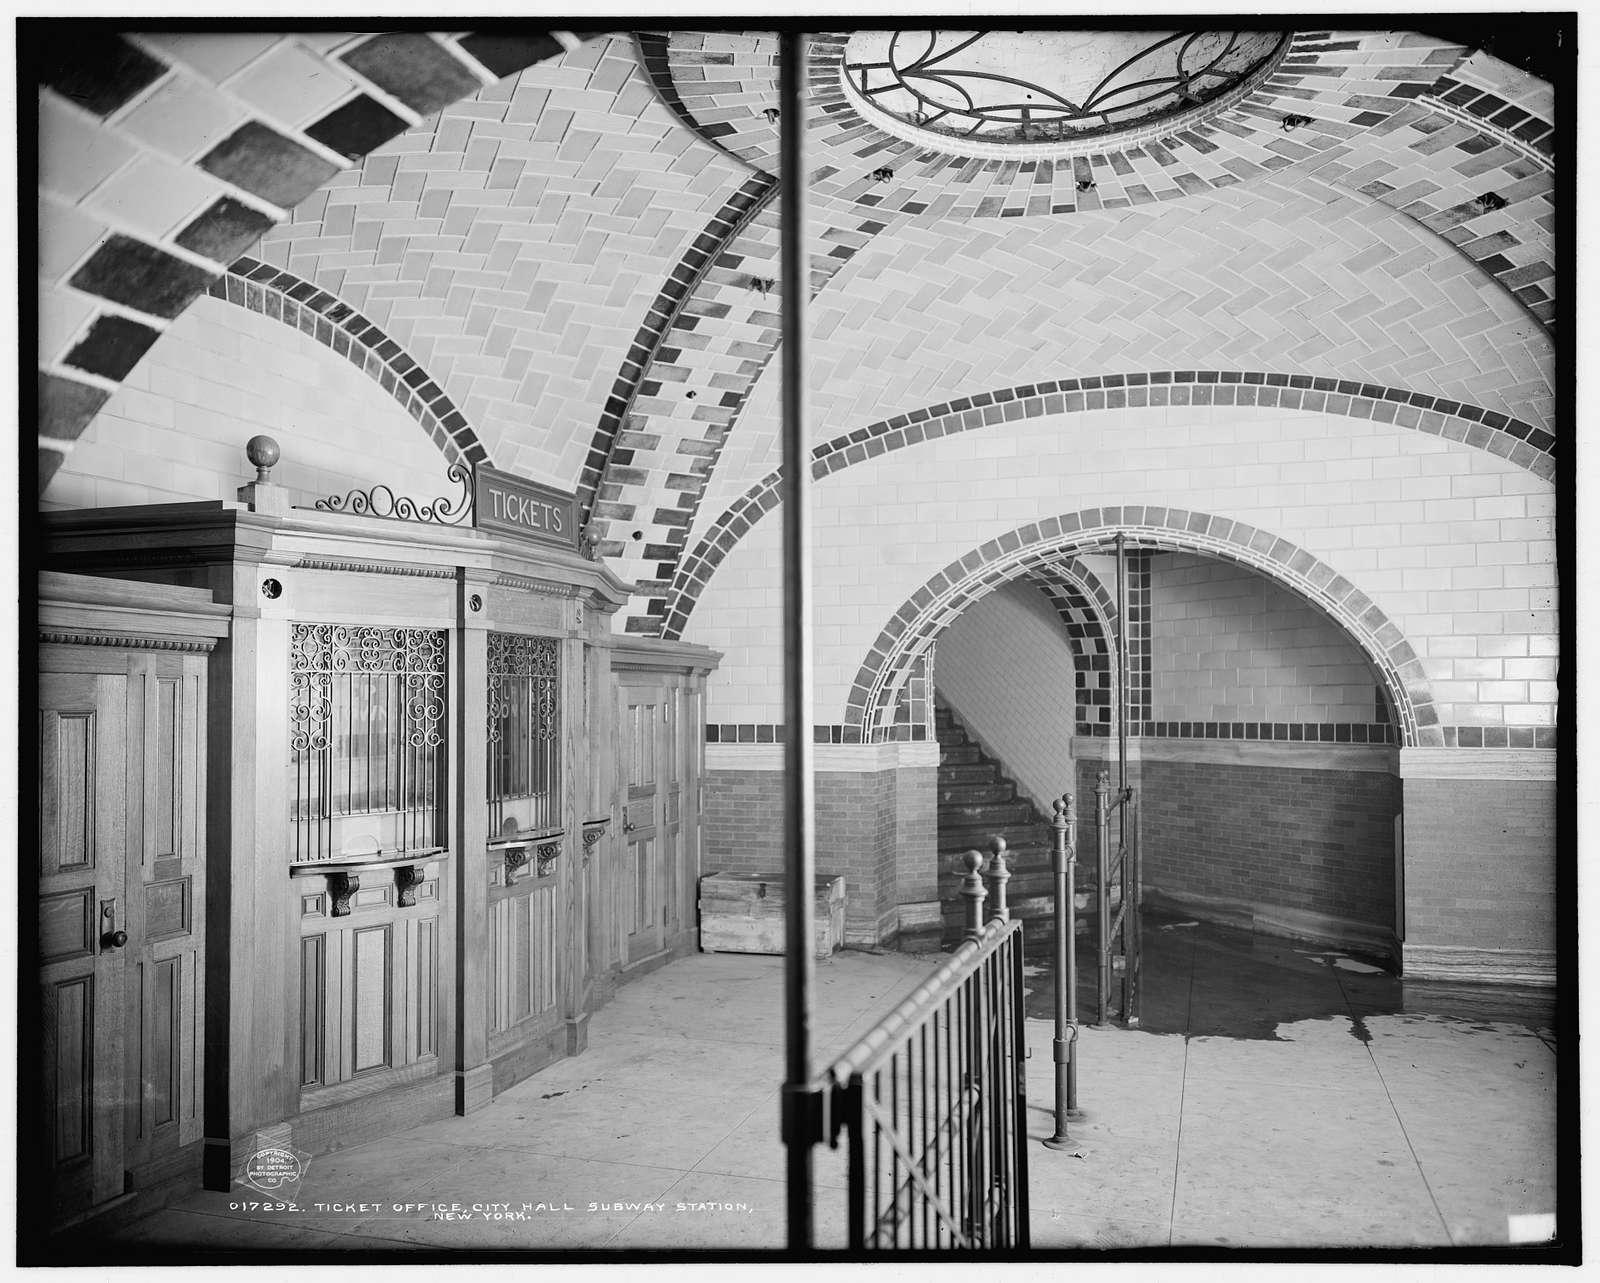 Ticket office, City Hall subway station, New York